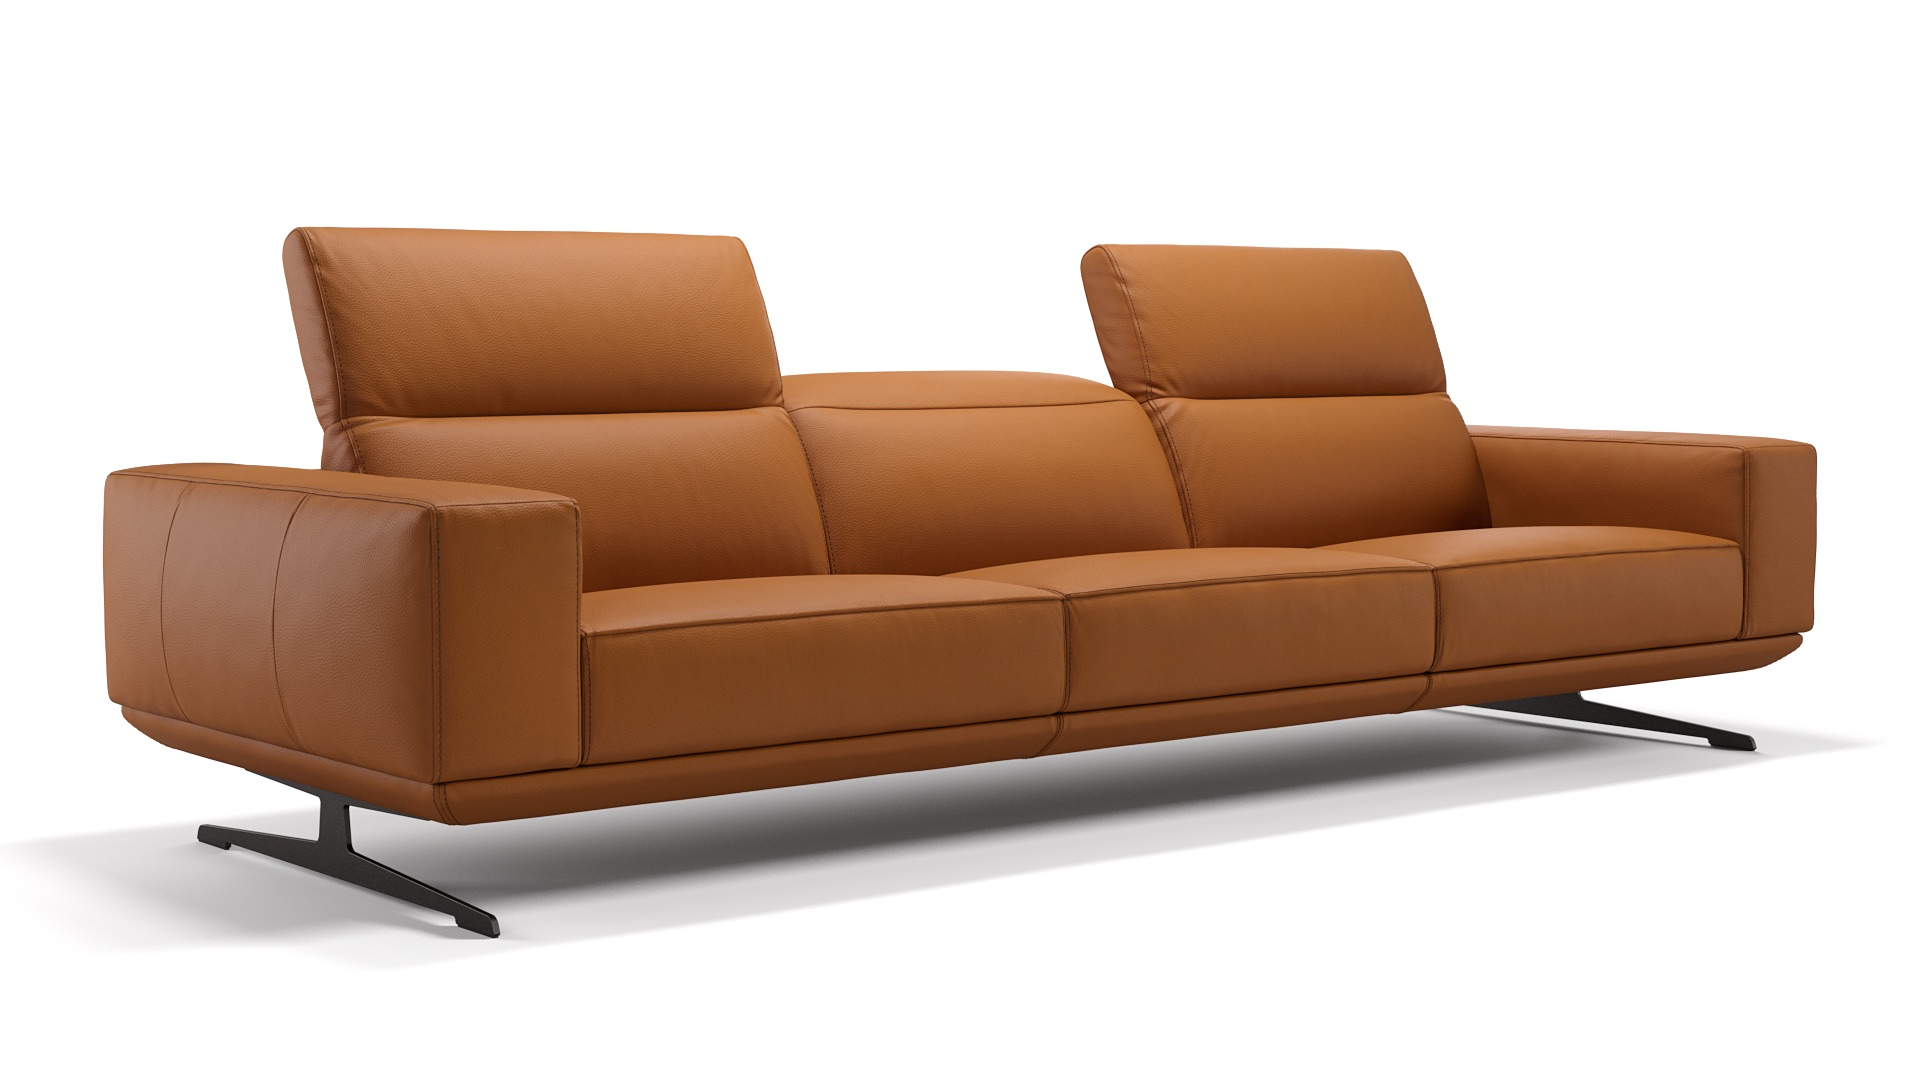 Leder 3-Sitzer Sofa XXL MERANO